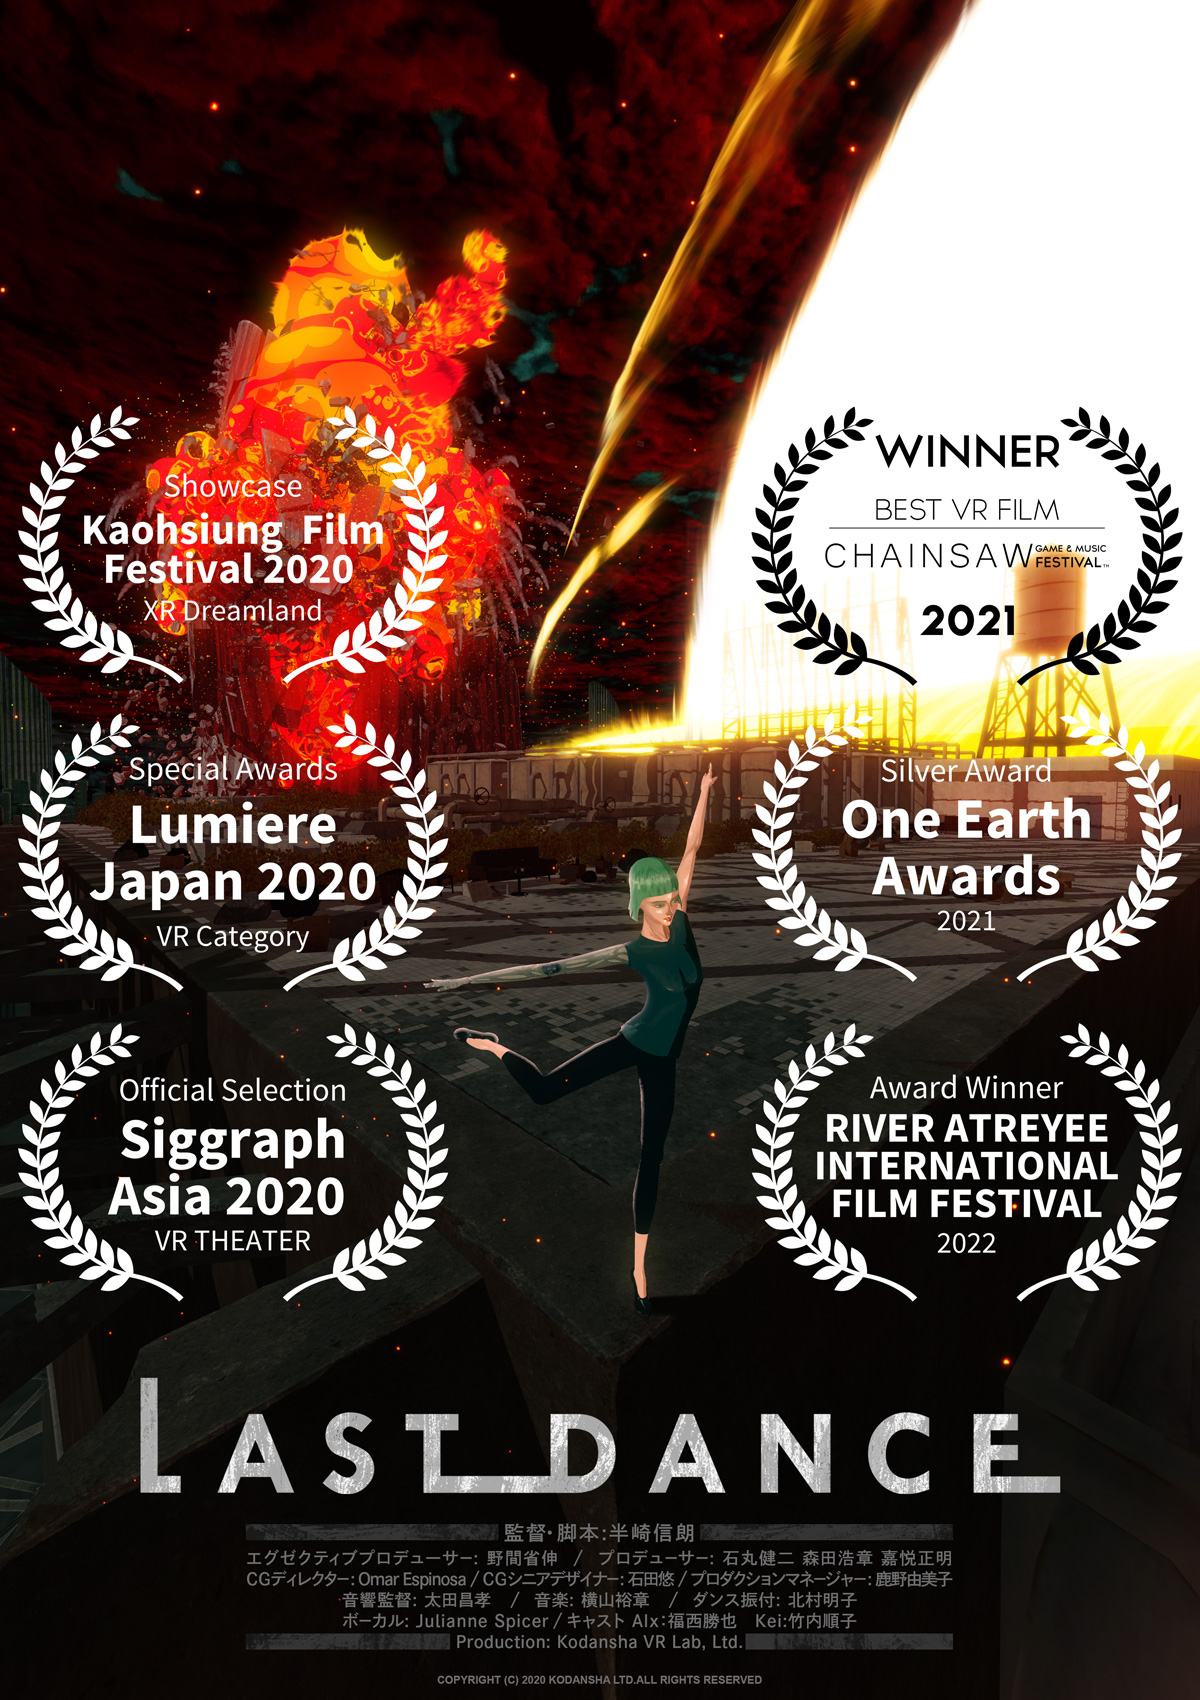 LAST_DANCE